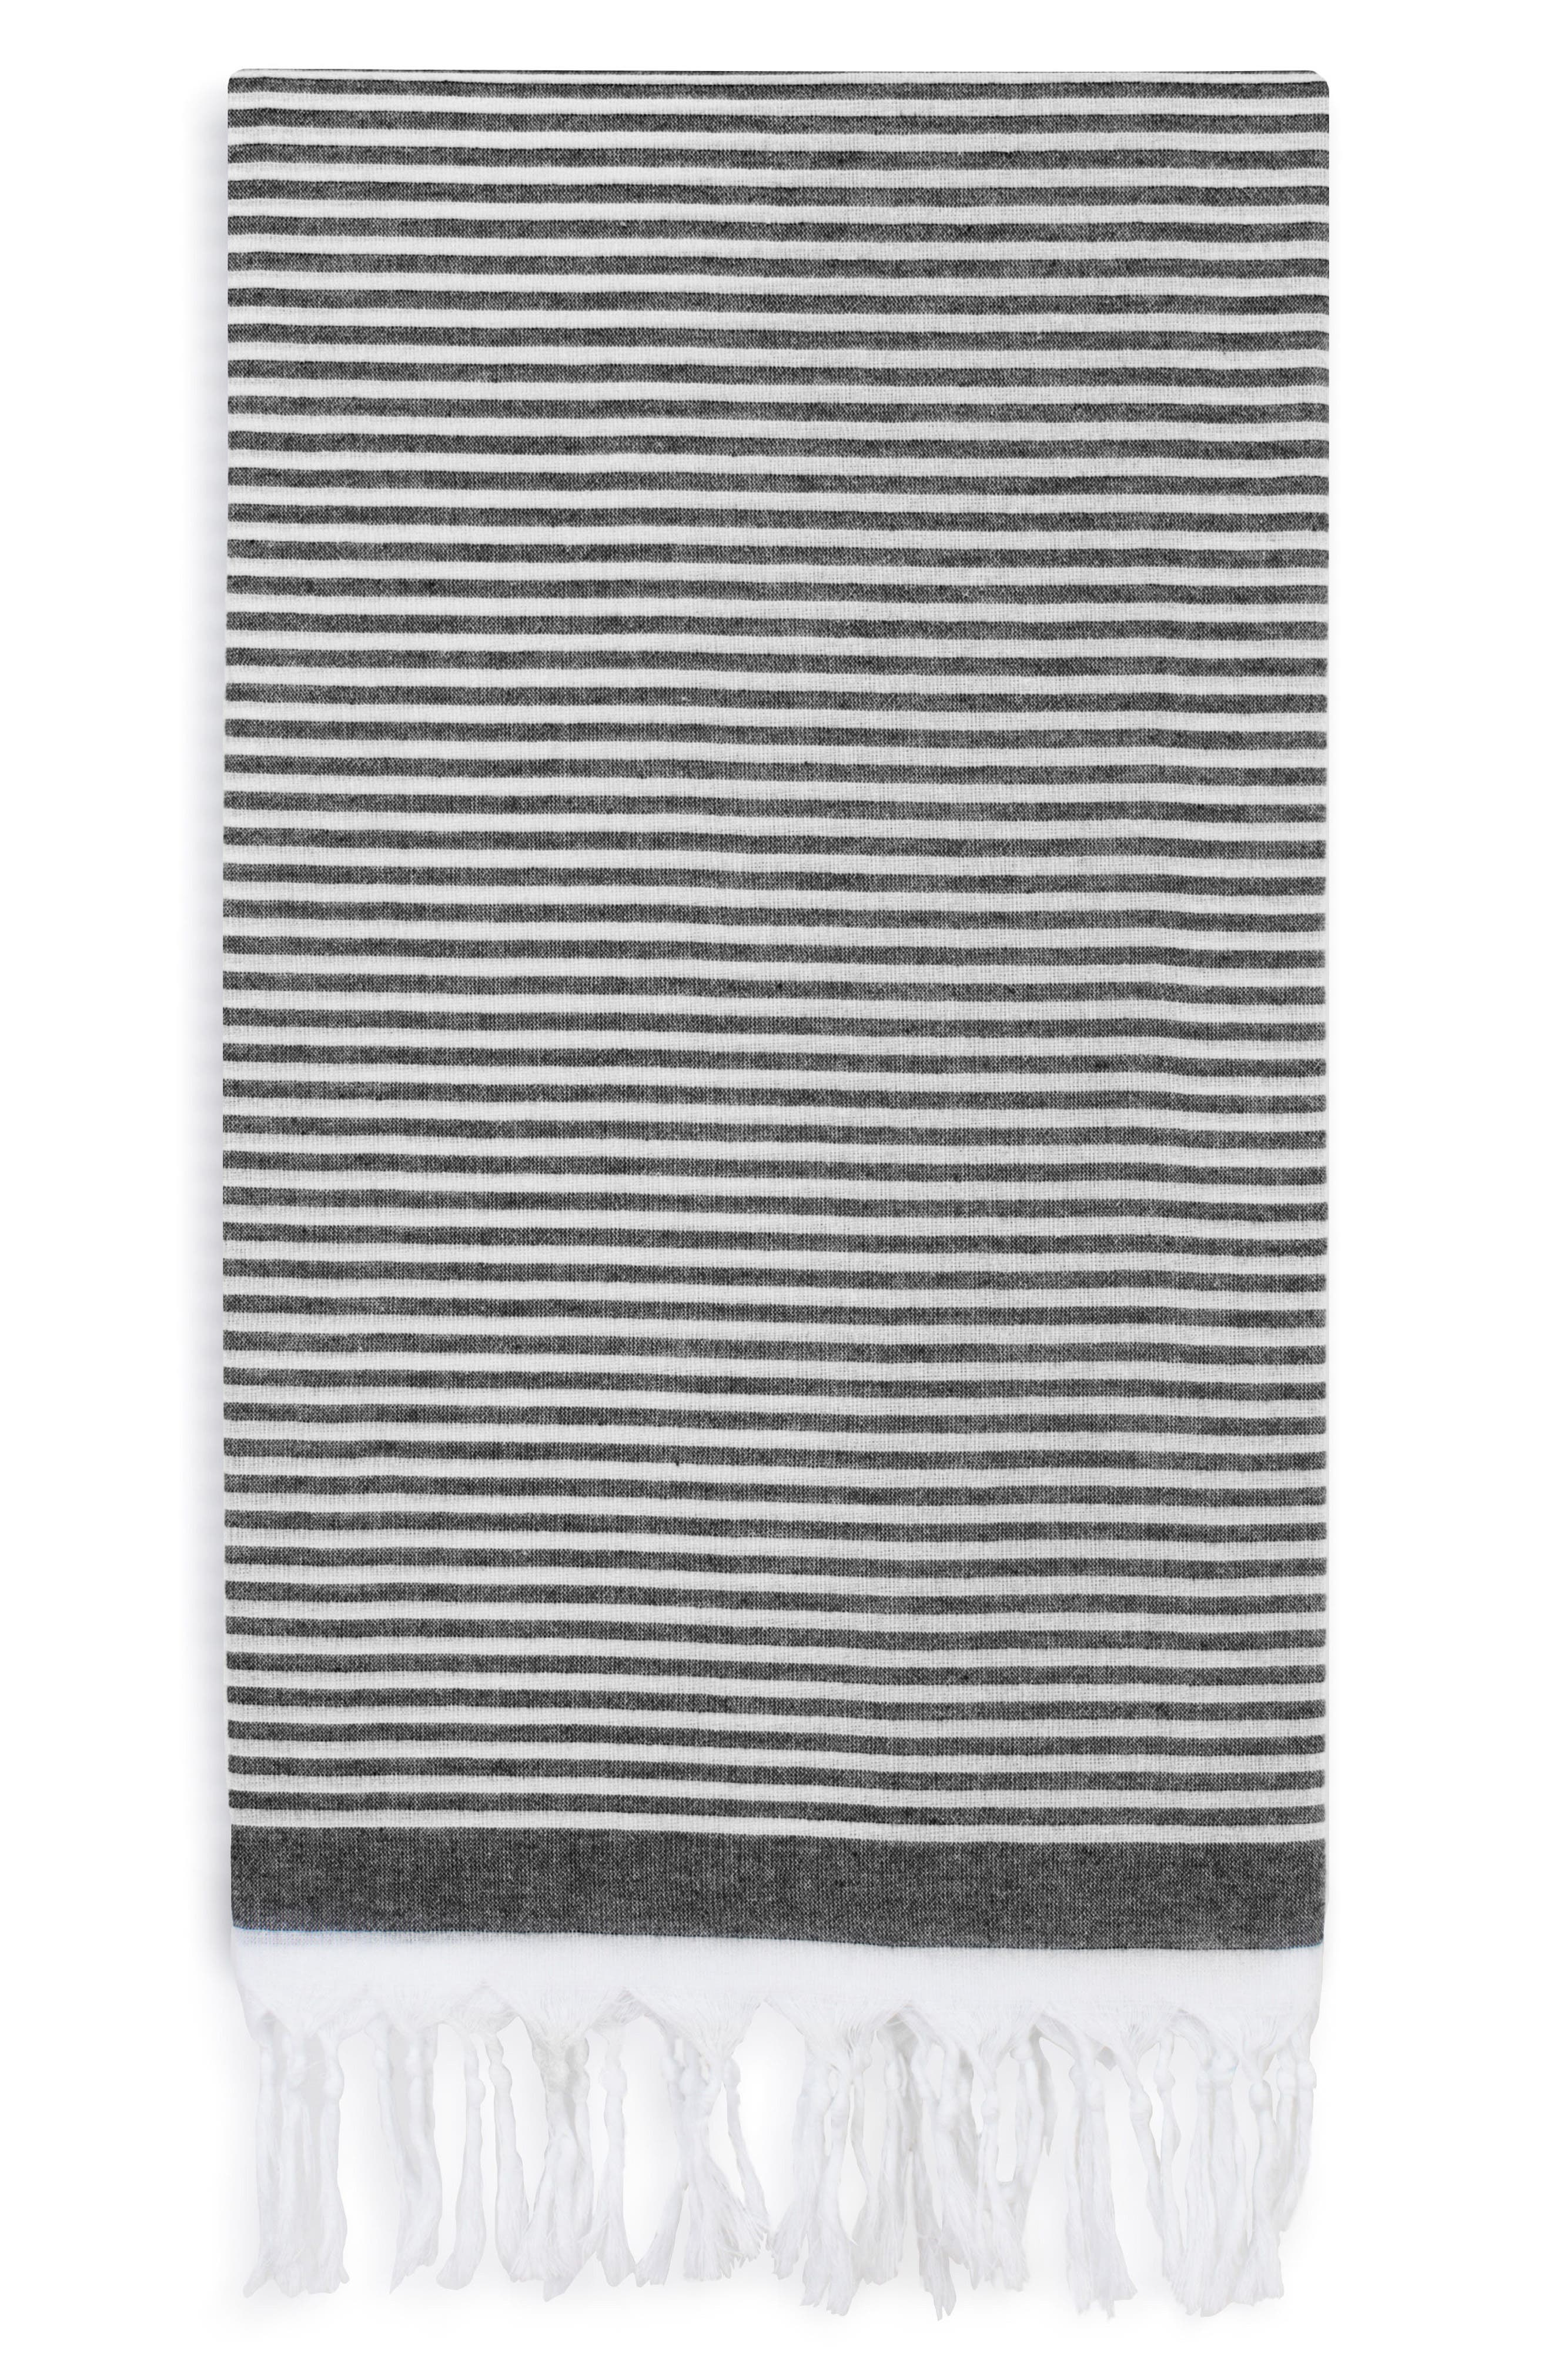 Soft Stripes Turkish Pestemal Towel,                         Main,                         color, BLACK